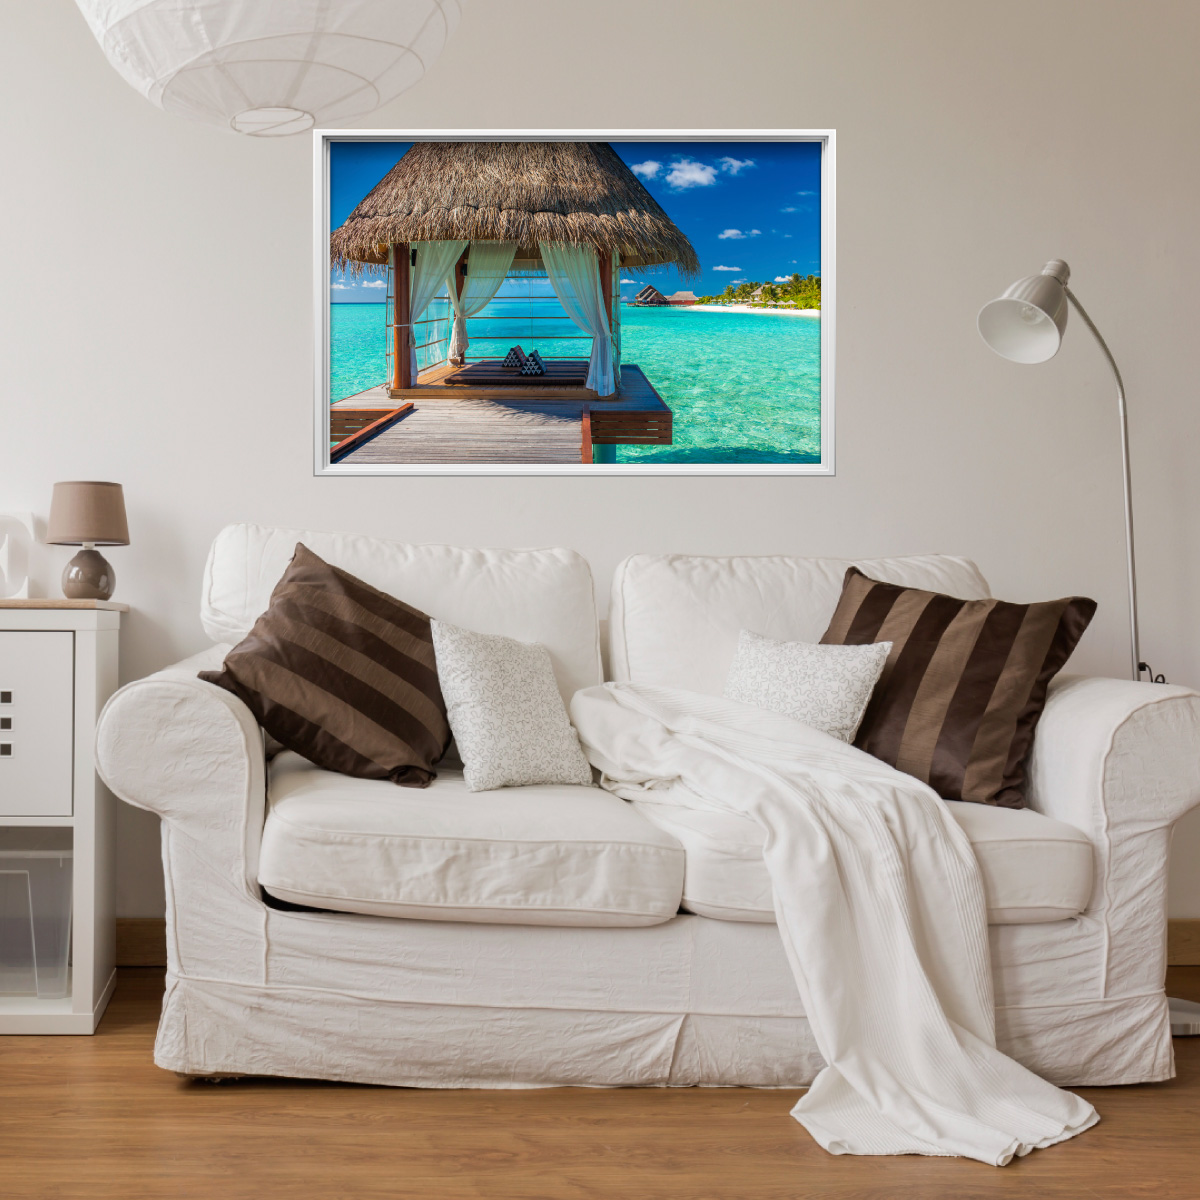 Sticker cadre photo paysage idyllique stickers art et design artistiques ambiance sticker - Style cadre photo ambiance ...